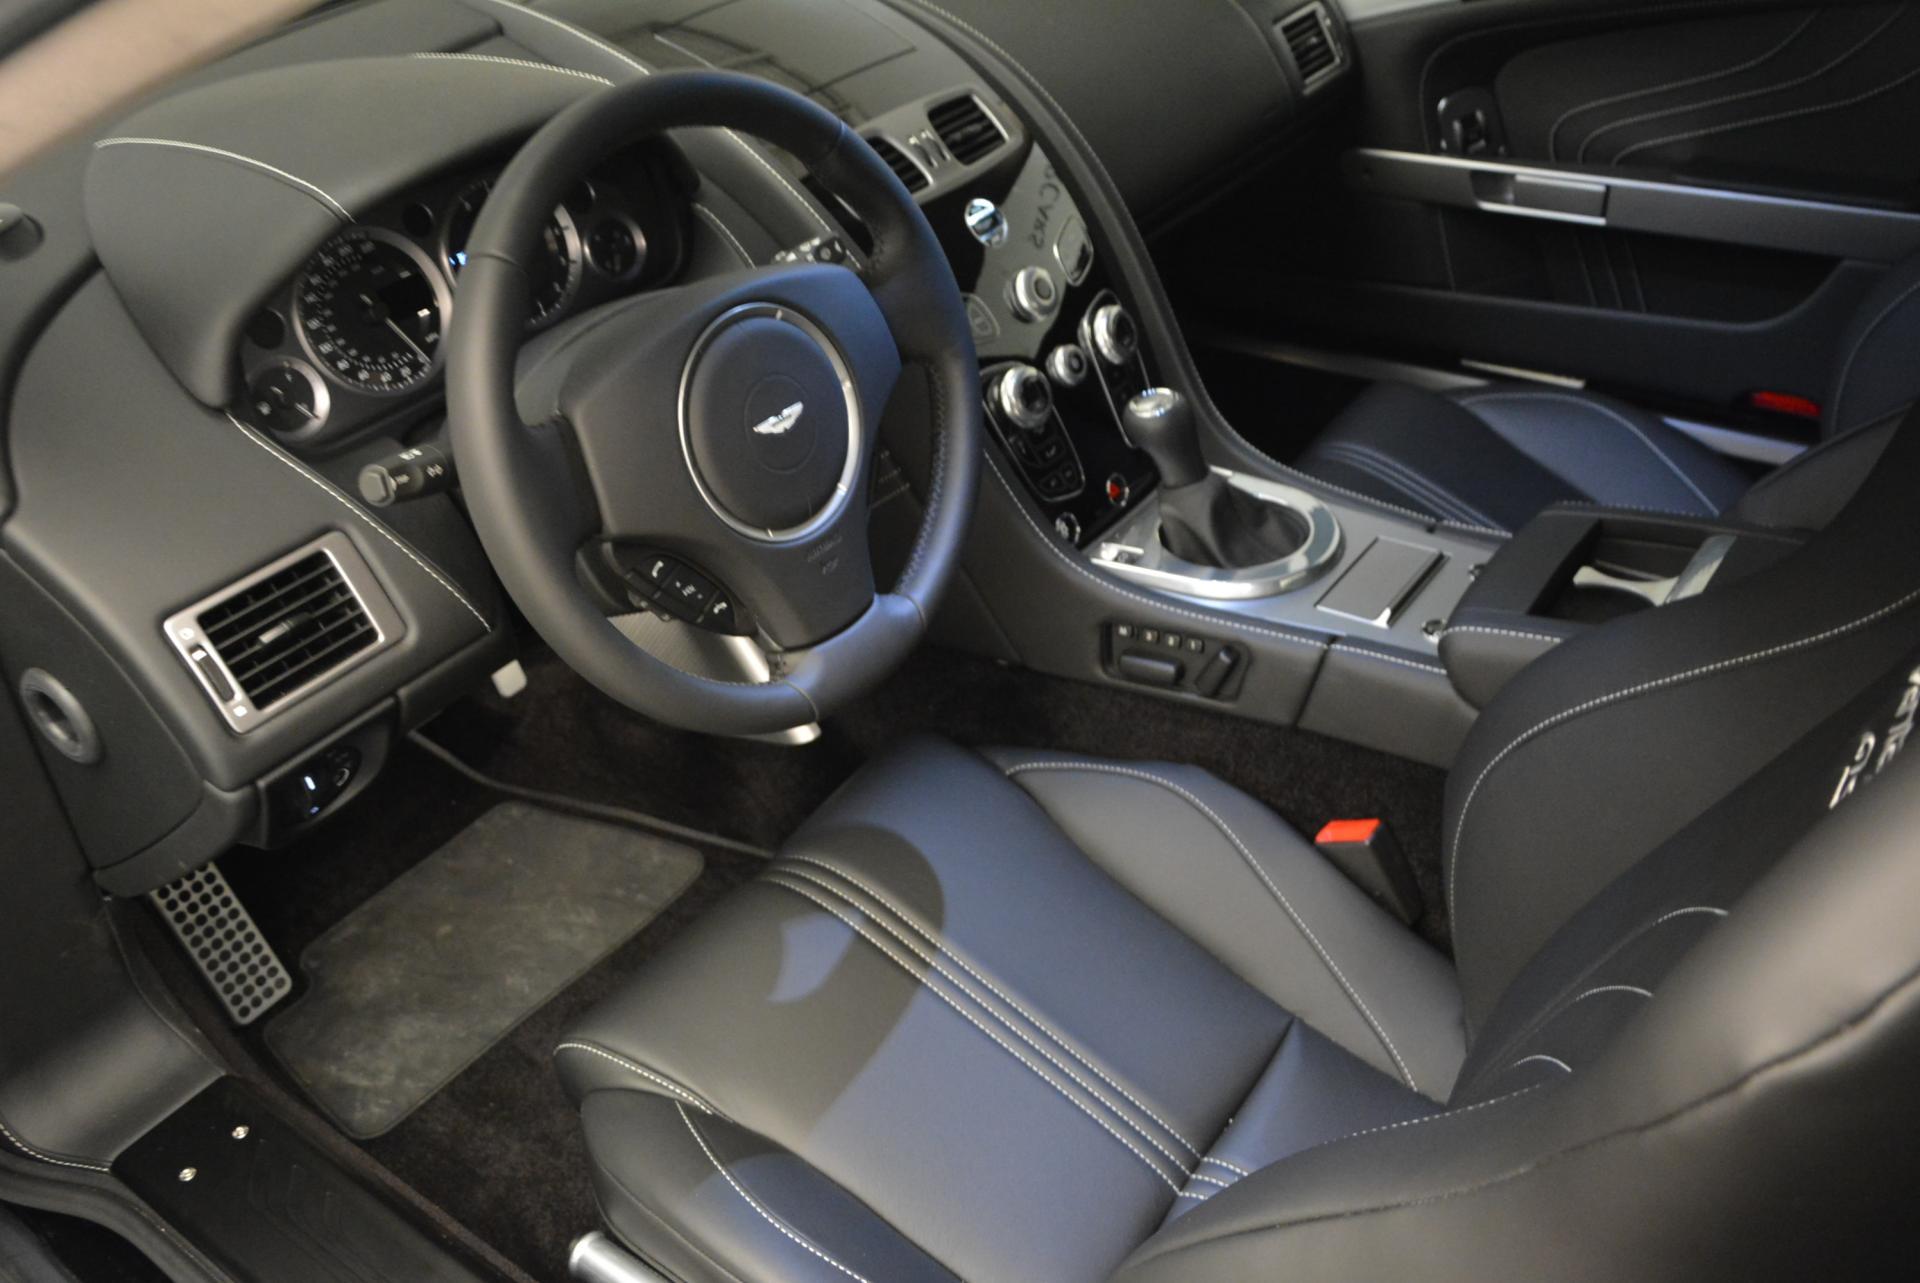 New 2016 Aston Martin V8 Vantage GTS S For Sale In Westport, CT 526_p11